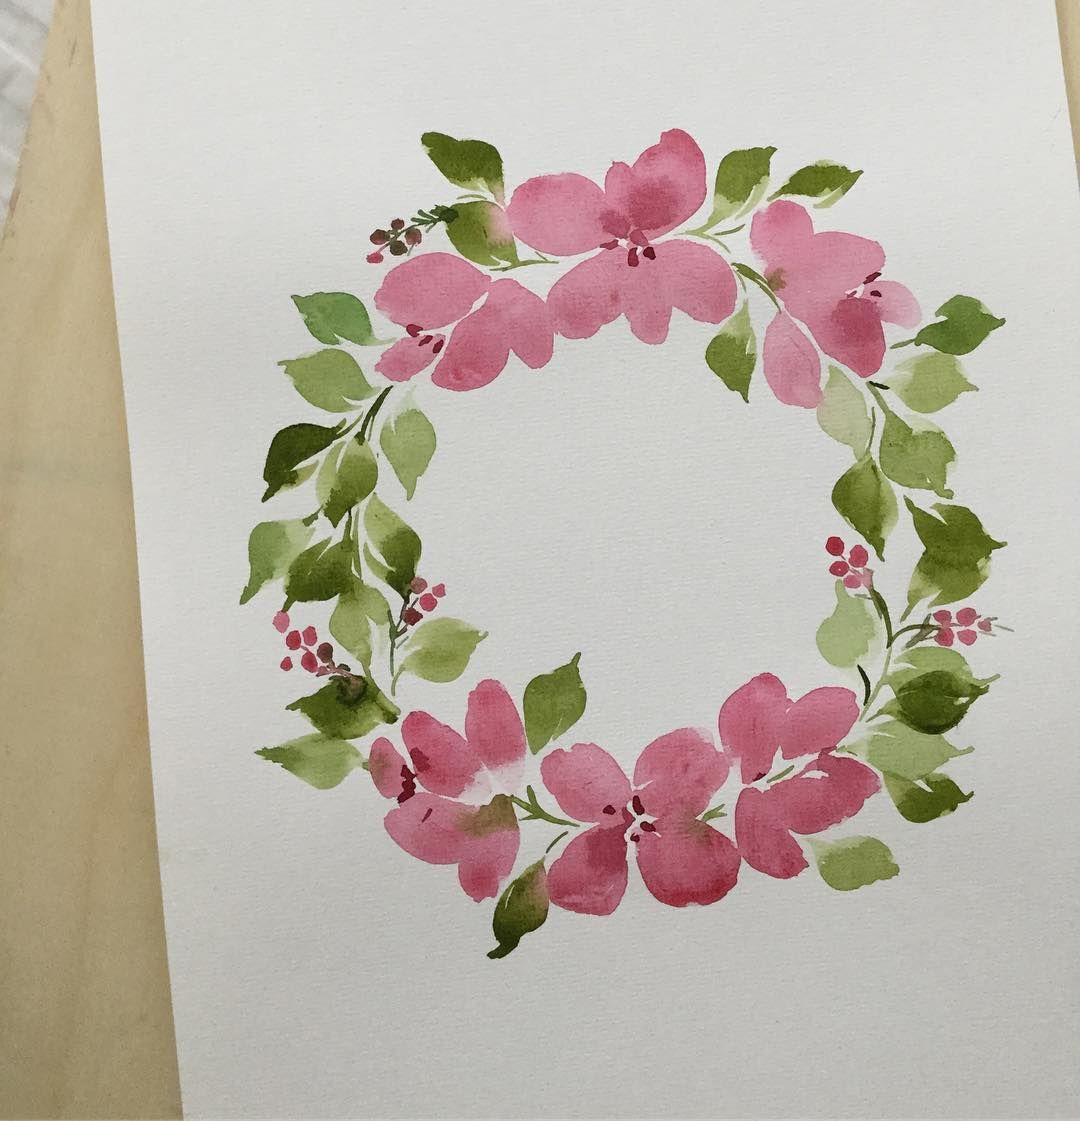 "Photo of Acrylic sign on Instagram: ""& # 39; s. . . #watercolor #watercolor flower #flower wreath #flower #watercolor wreath """